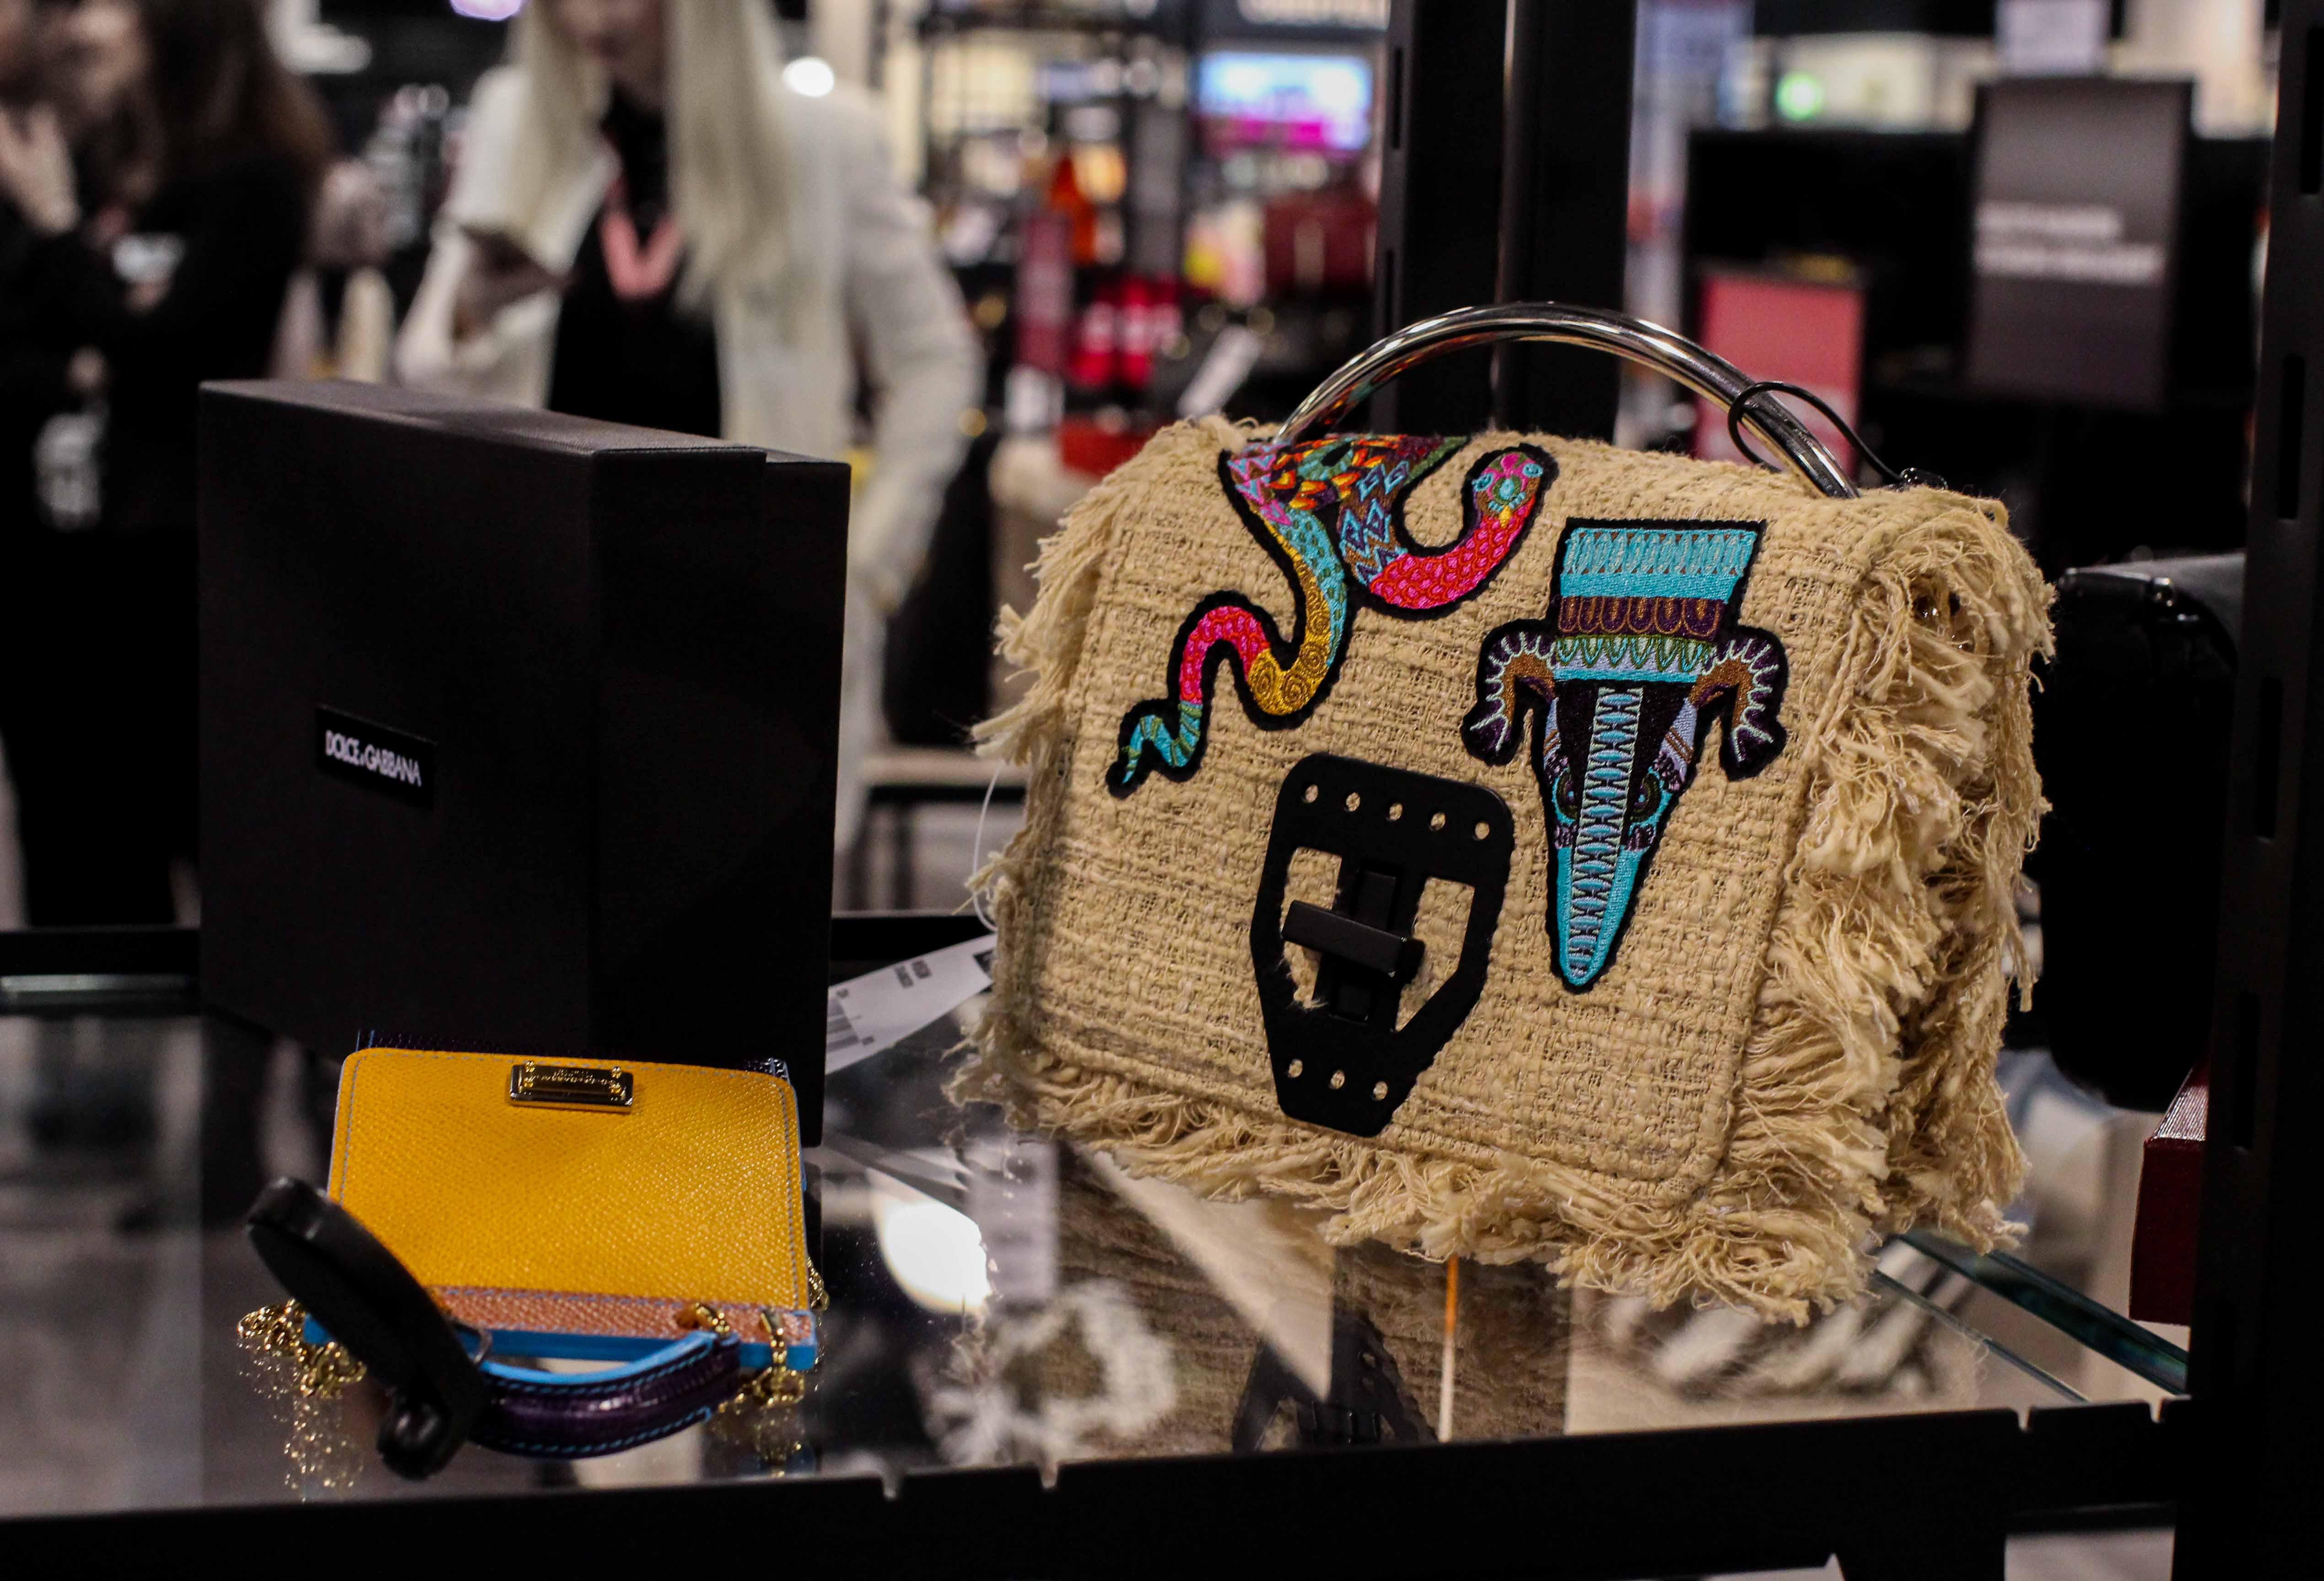 Designertaschen günstig Store Opening Saks OFF 5th Avenue Bonn Premium-Marken Outletpreis Designer Outlet Bonn Modeblog